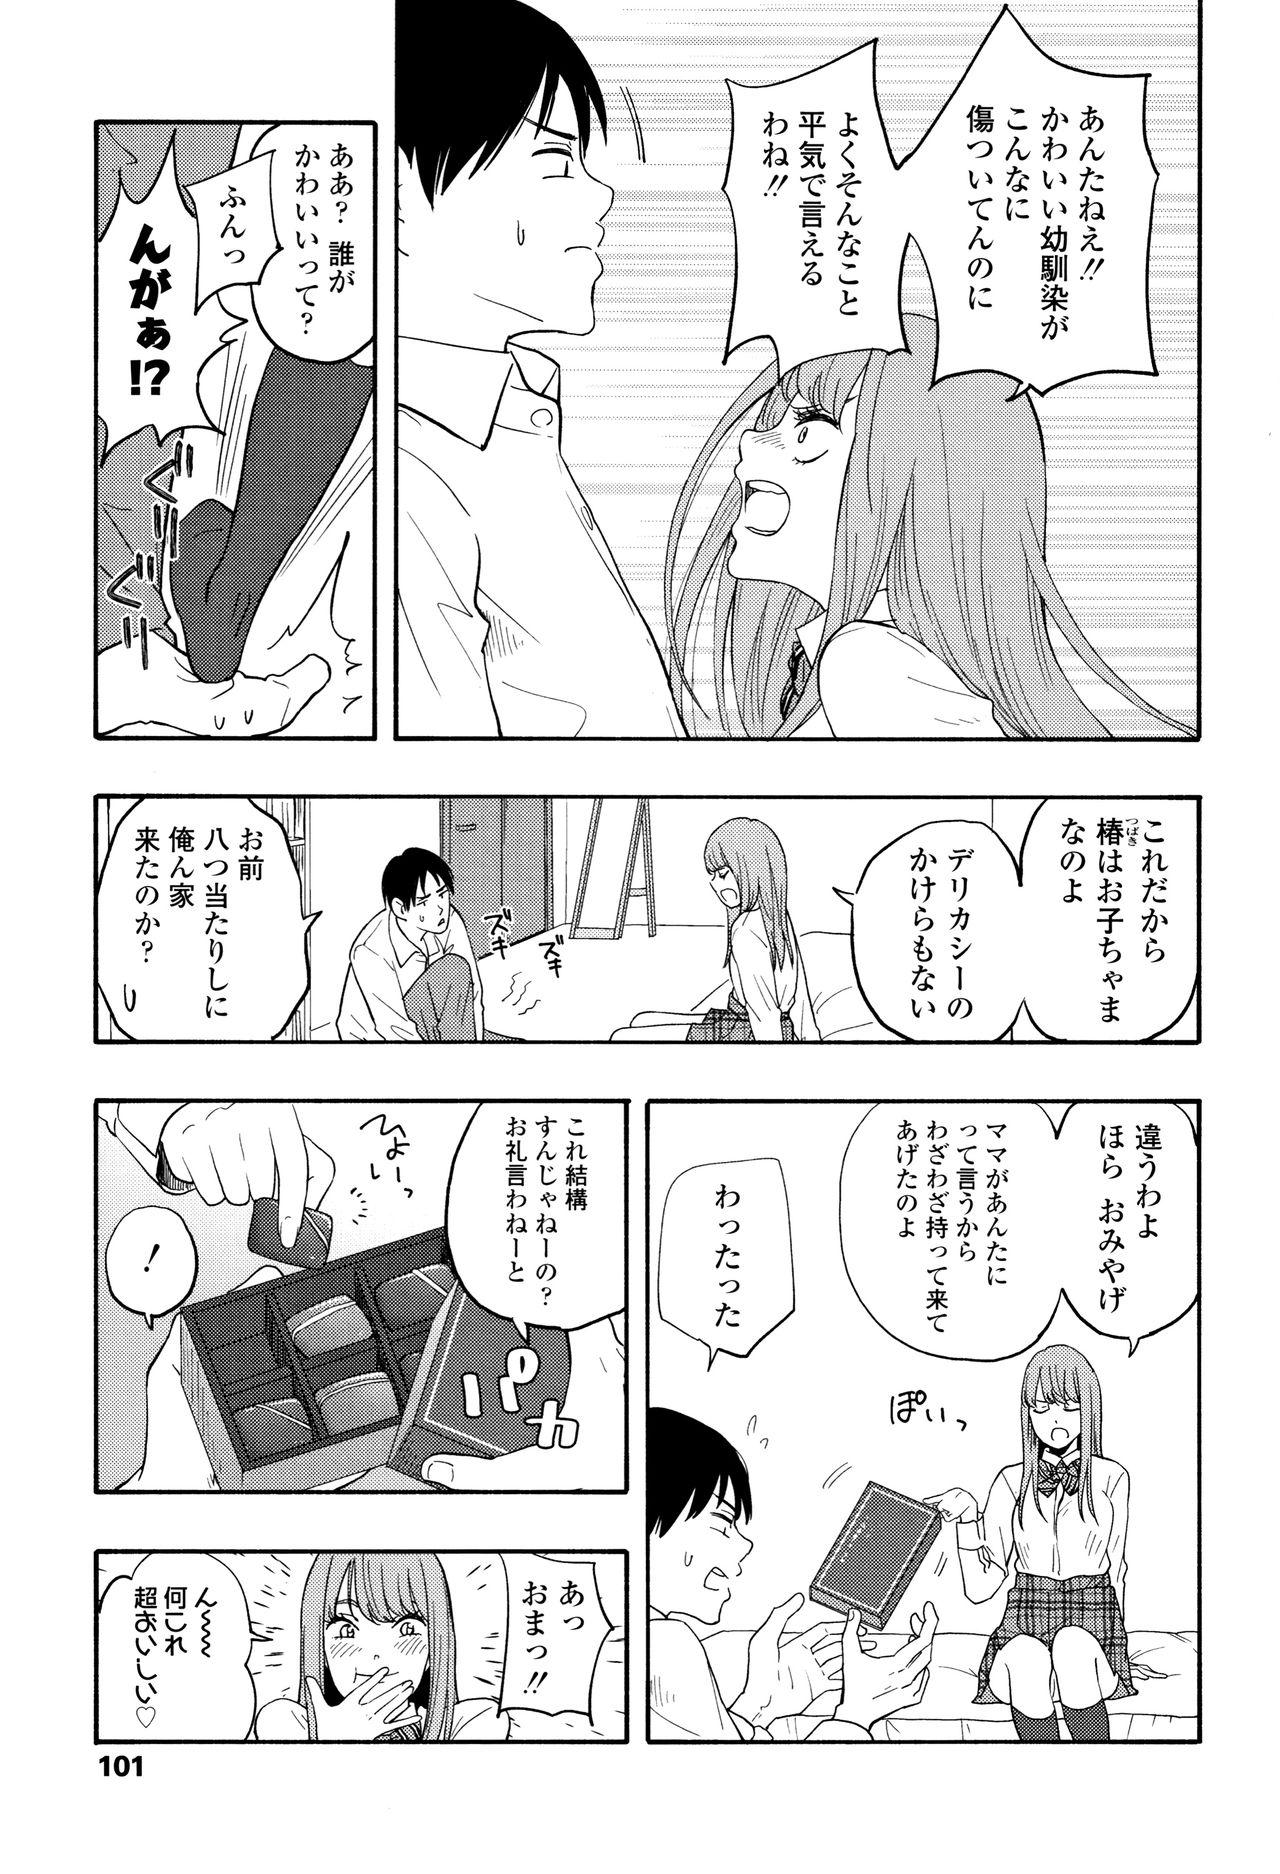 Shishunki no Eros - puberty eros 103